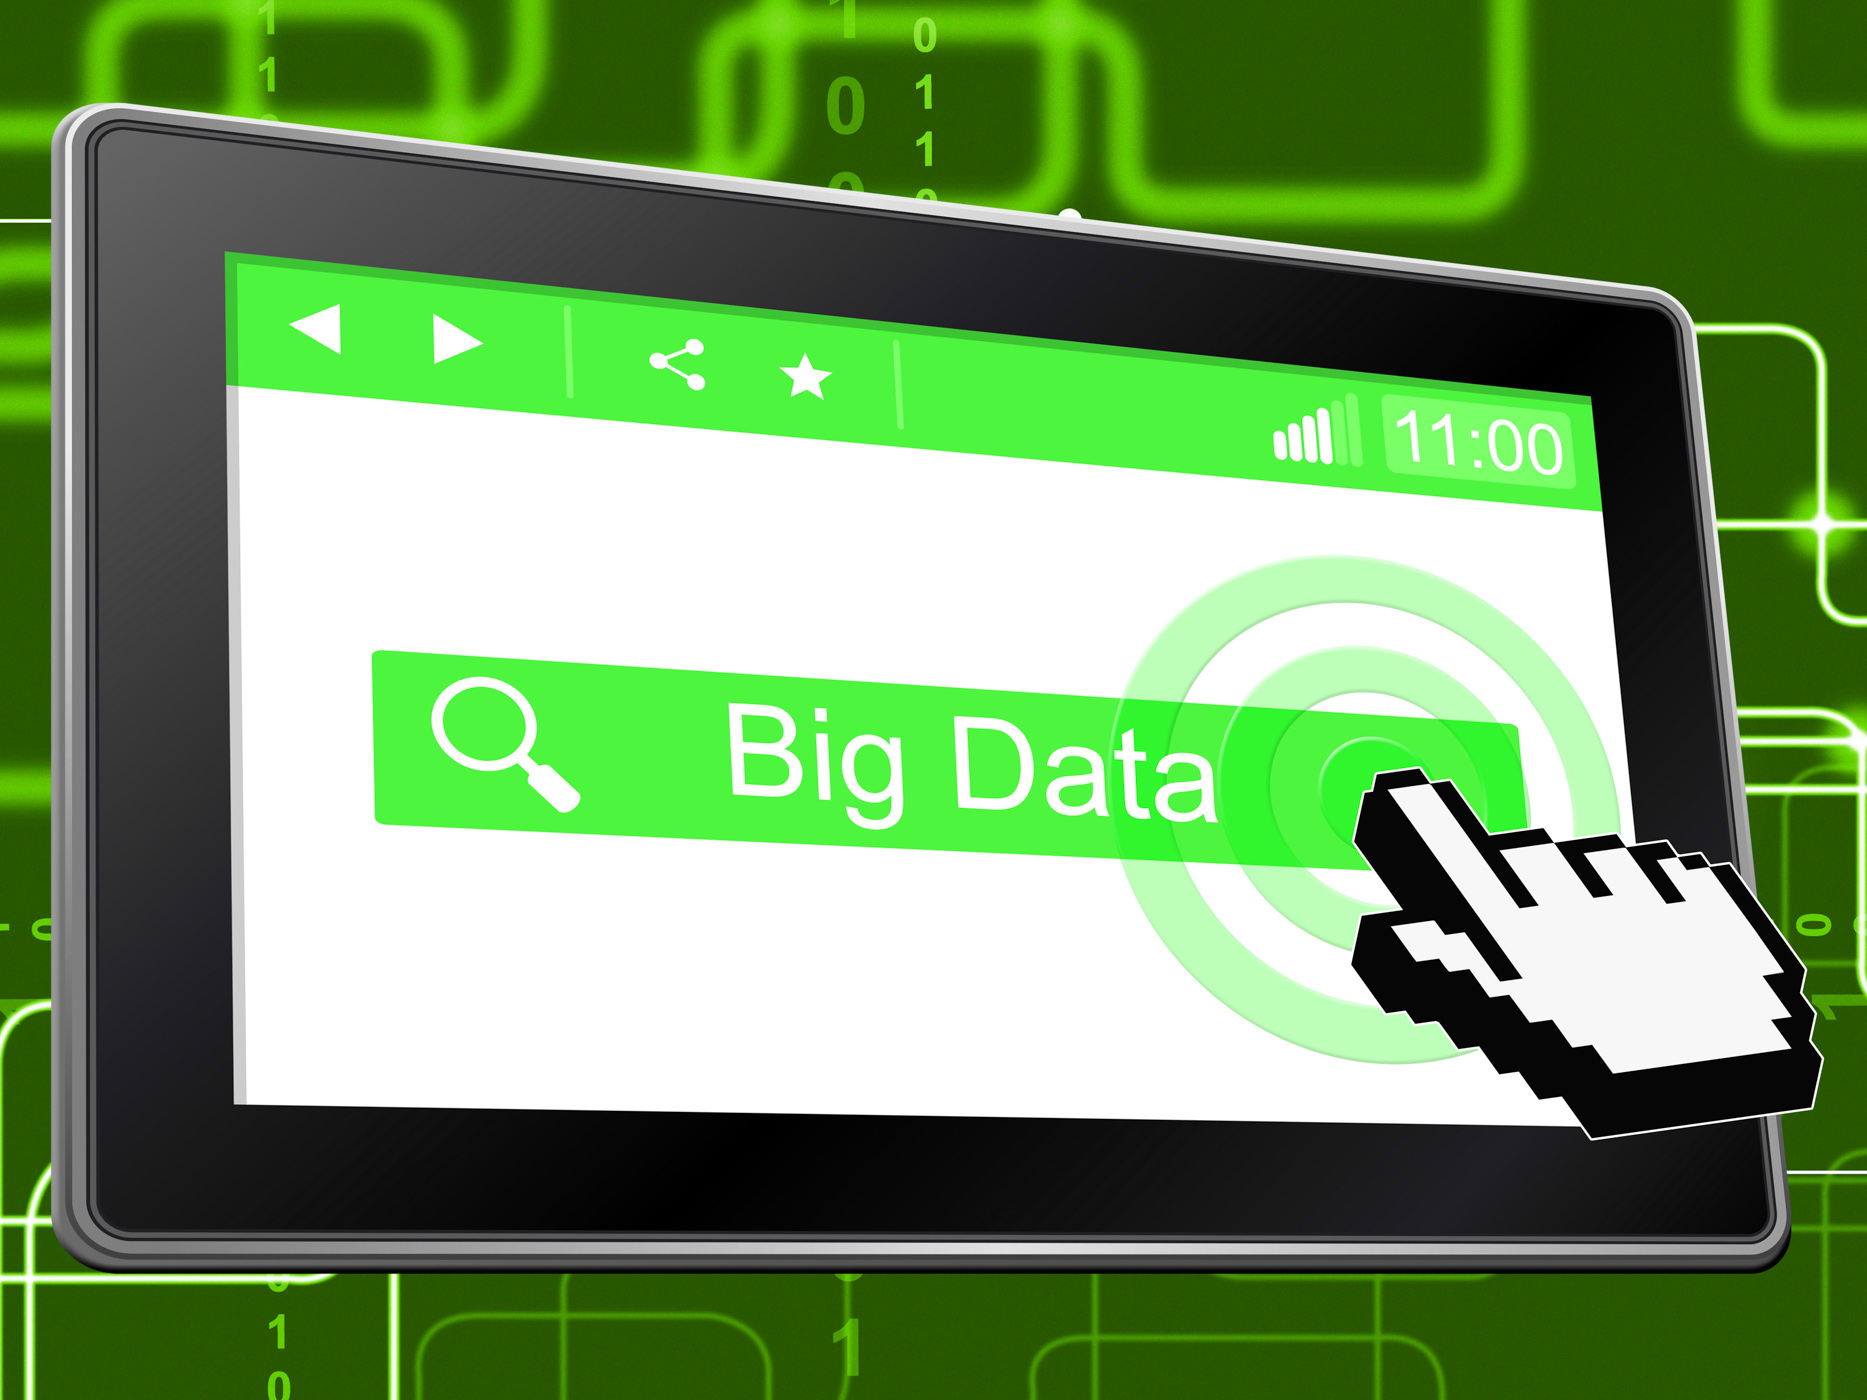 Big Data Means World Wide Web And Www, Bigdata, Network, Worldwideweb, Websites, HQ Photo